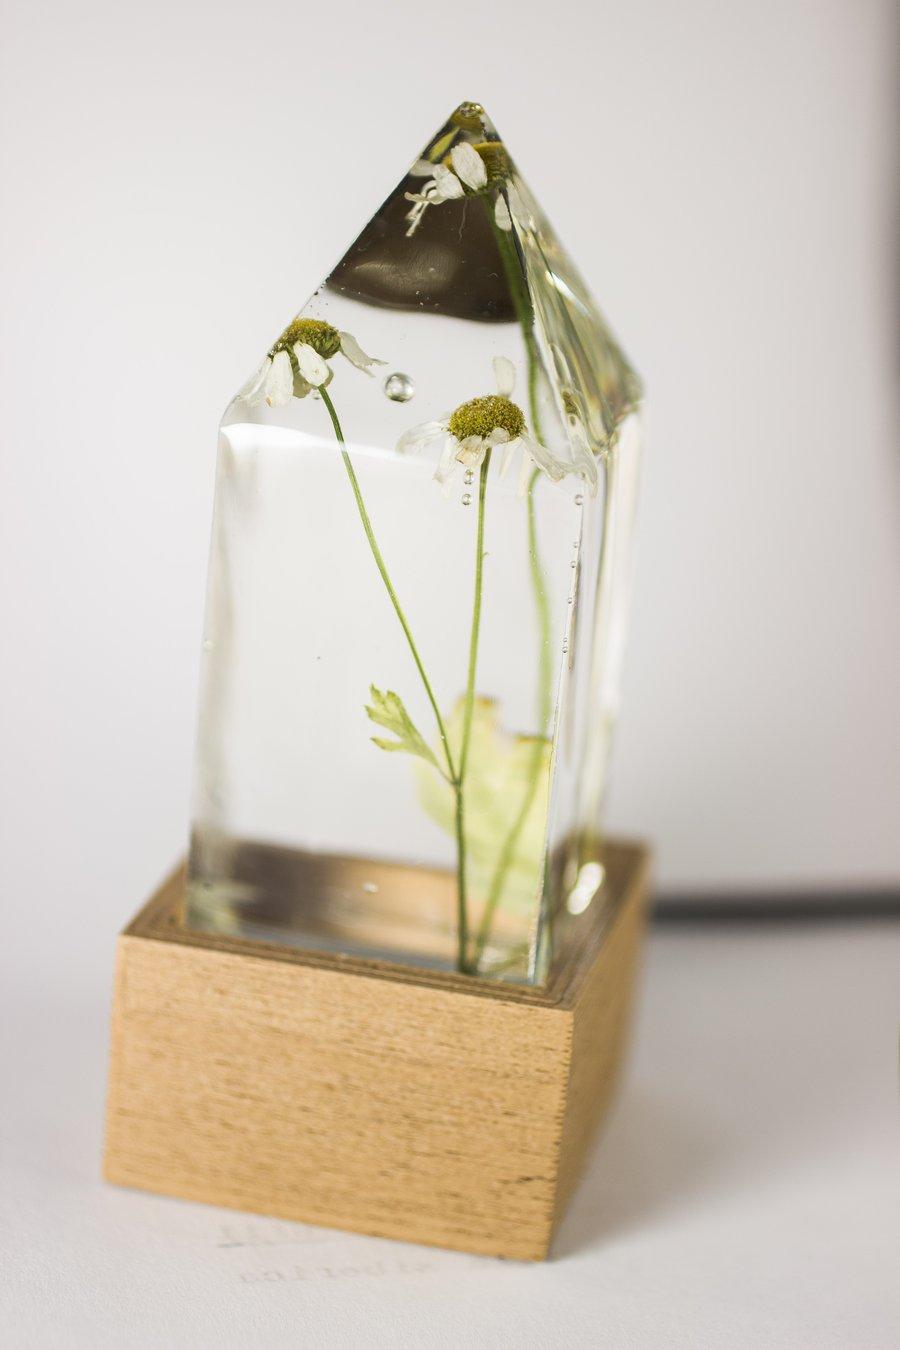 Image of Feverfew (Tanacetum parthenium) - Floral Prism Desk Light #4